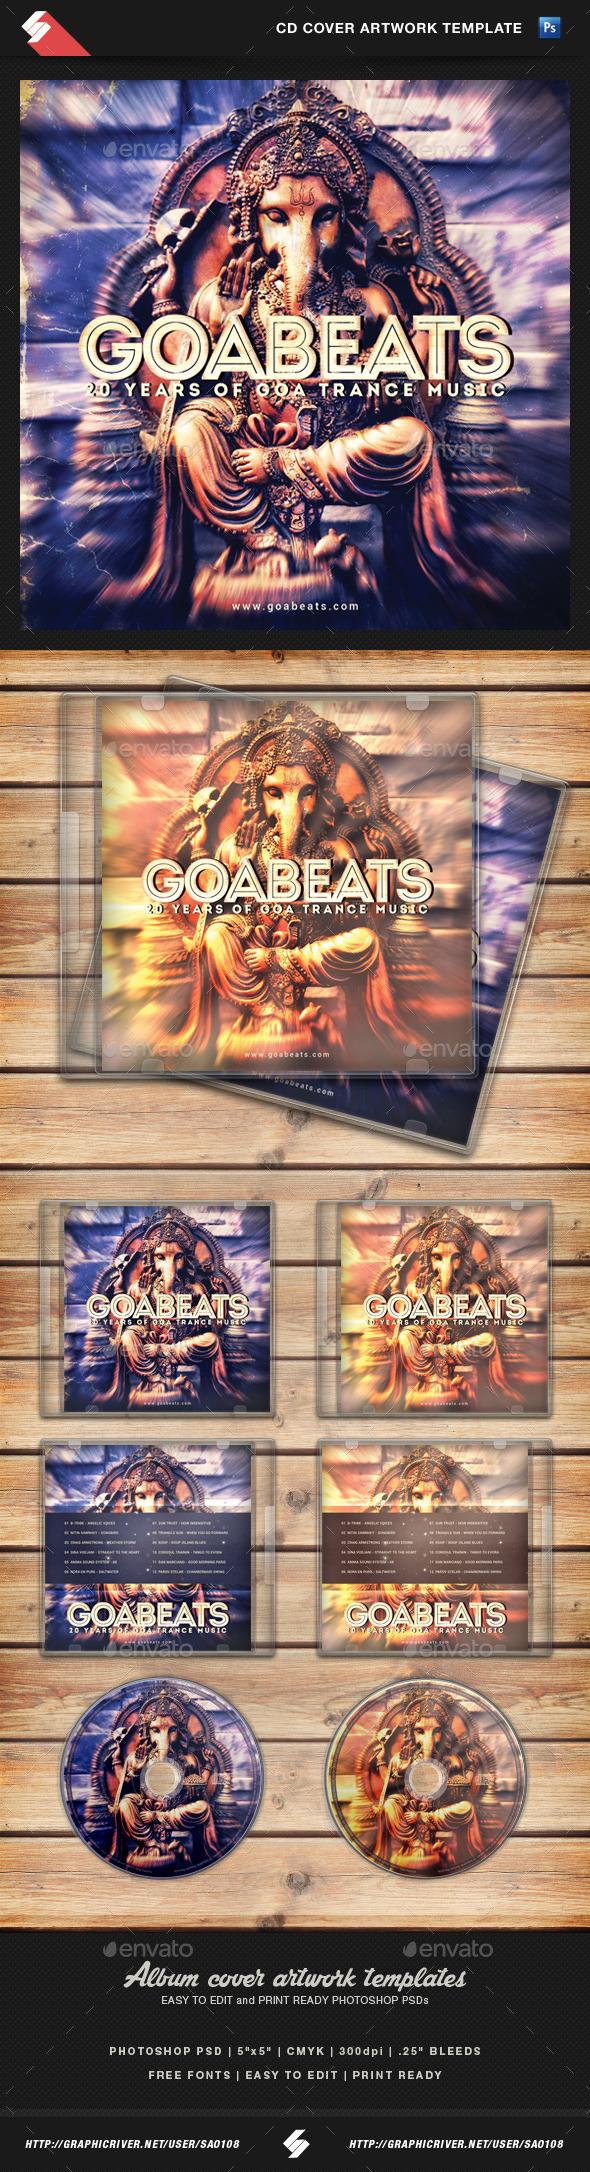 GraphicRiver Goa Beats Psytrance Album CD Cover Template 10872957